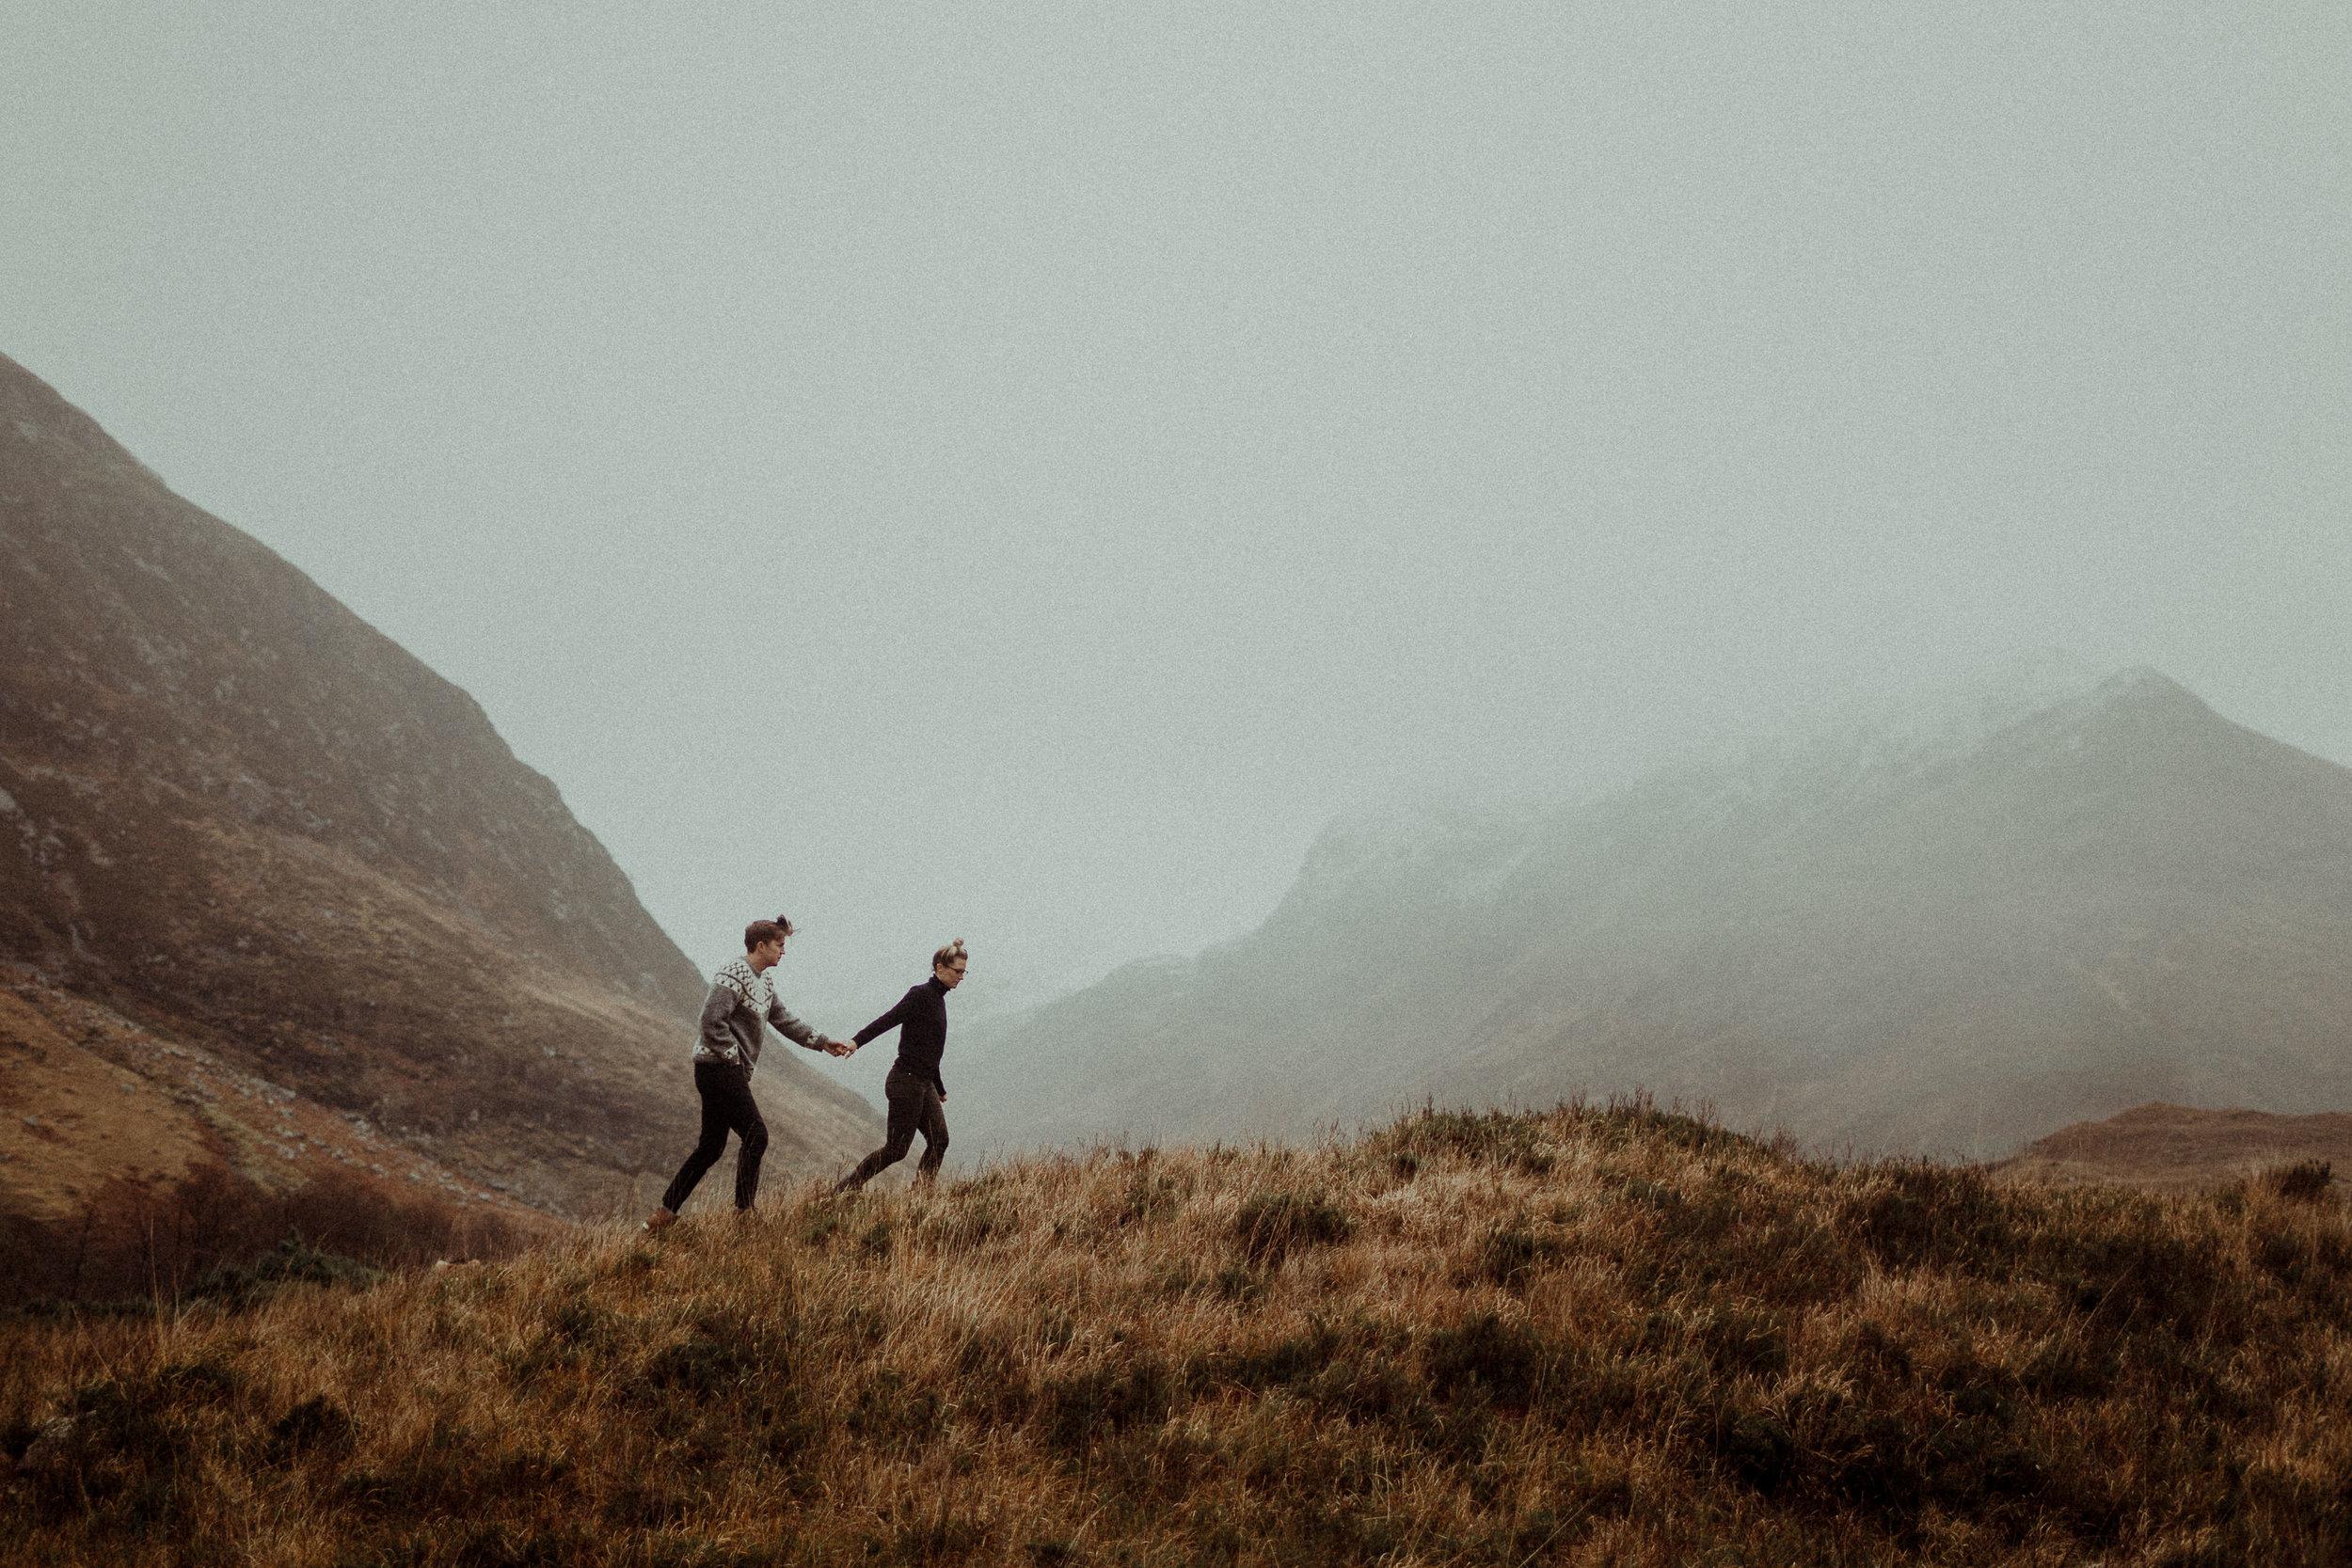 Isle-Of-Skye-Elopement-scotland-wedding-photographer-7.jpg